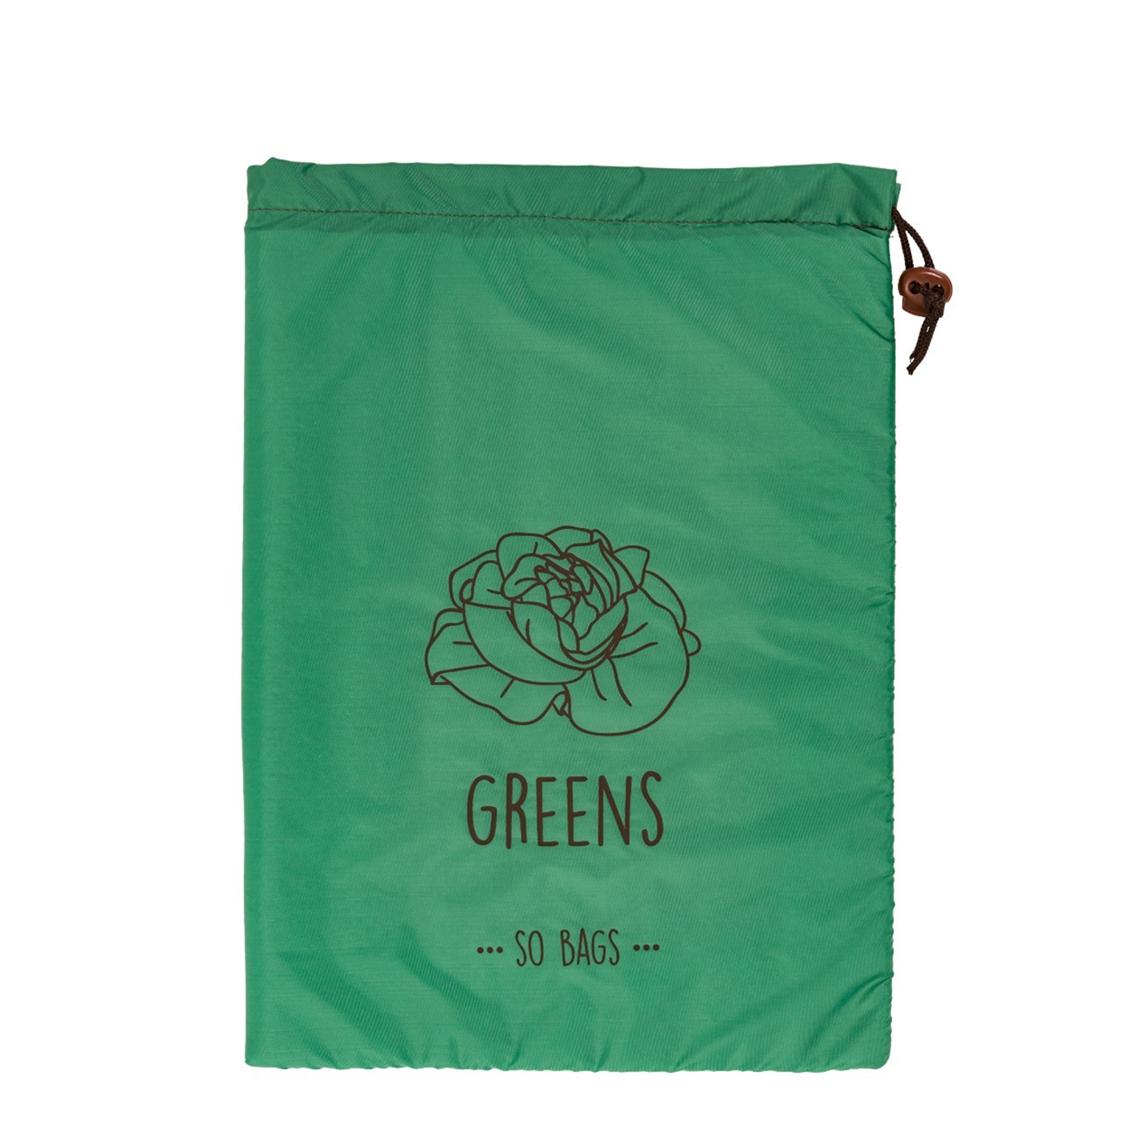 Saco So Bags Greens